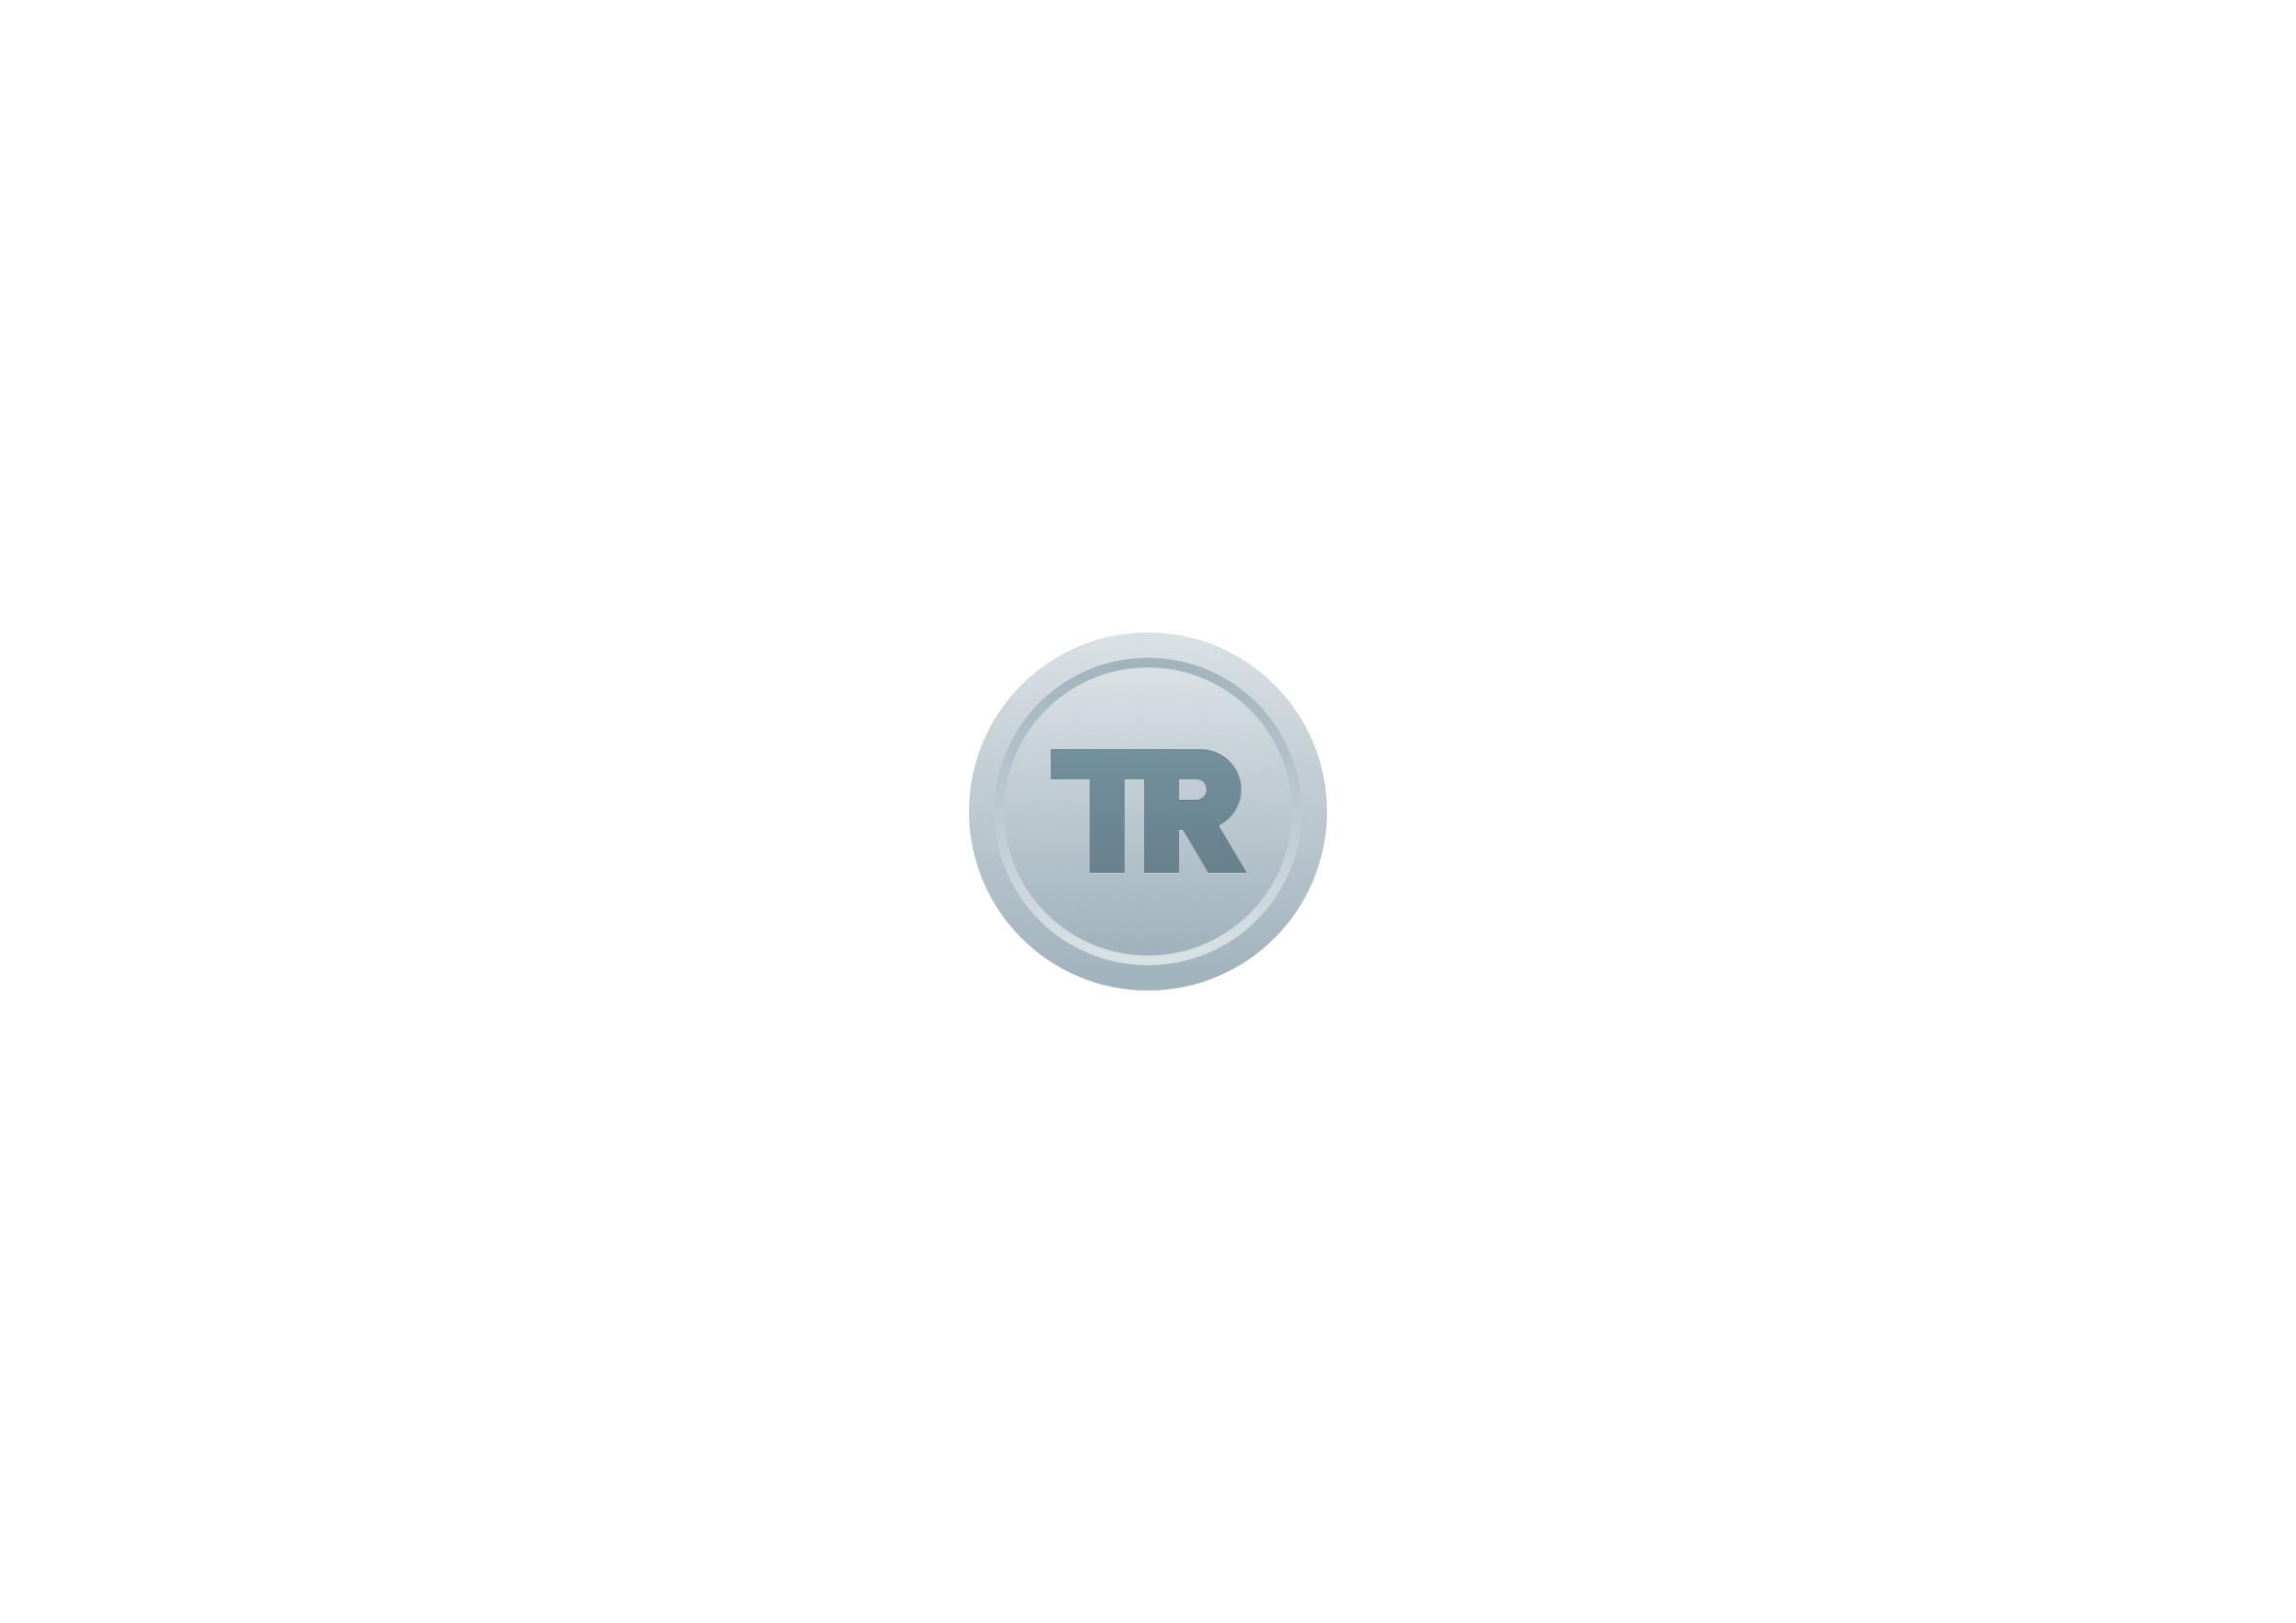 travel-reward-logo